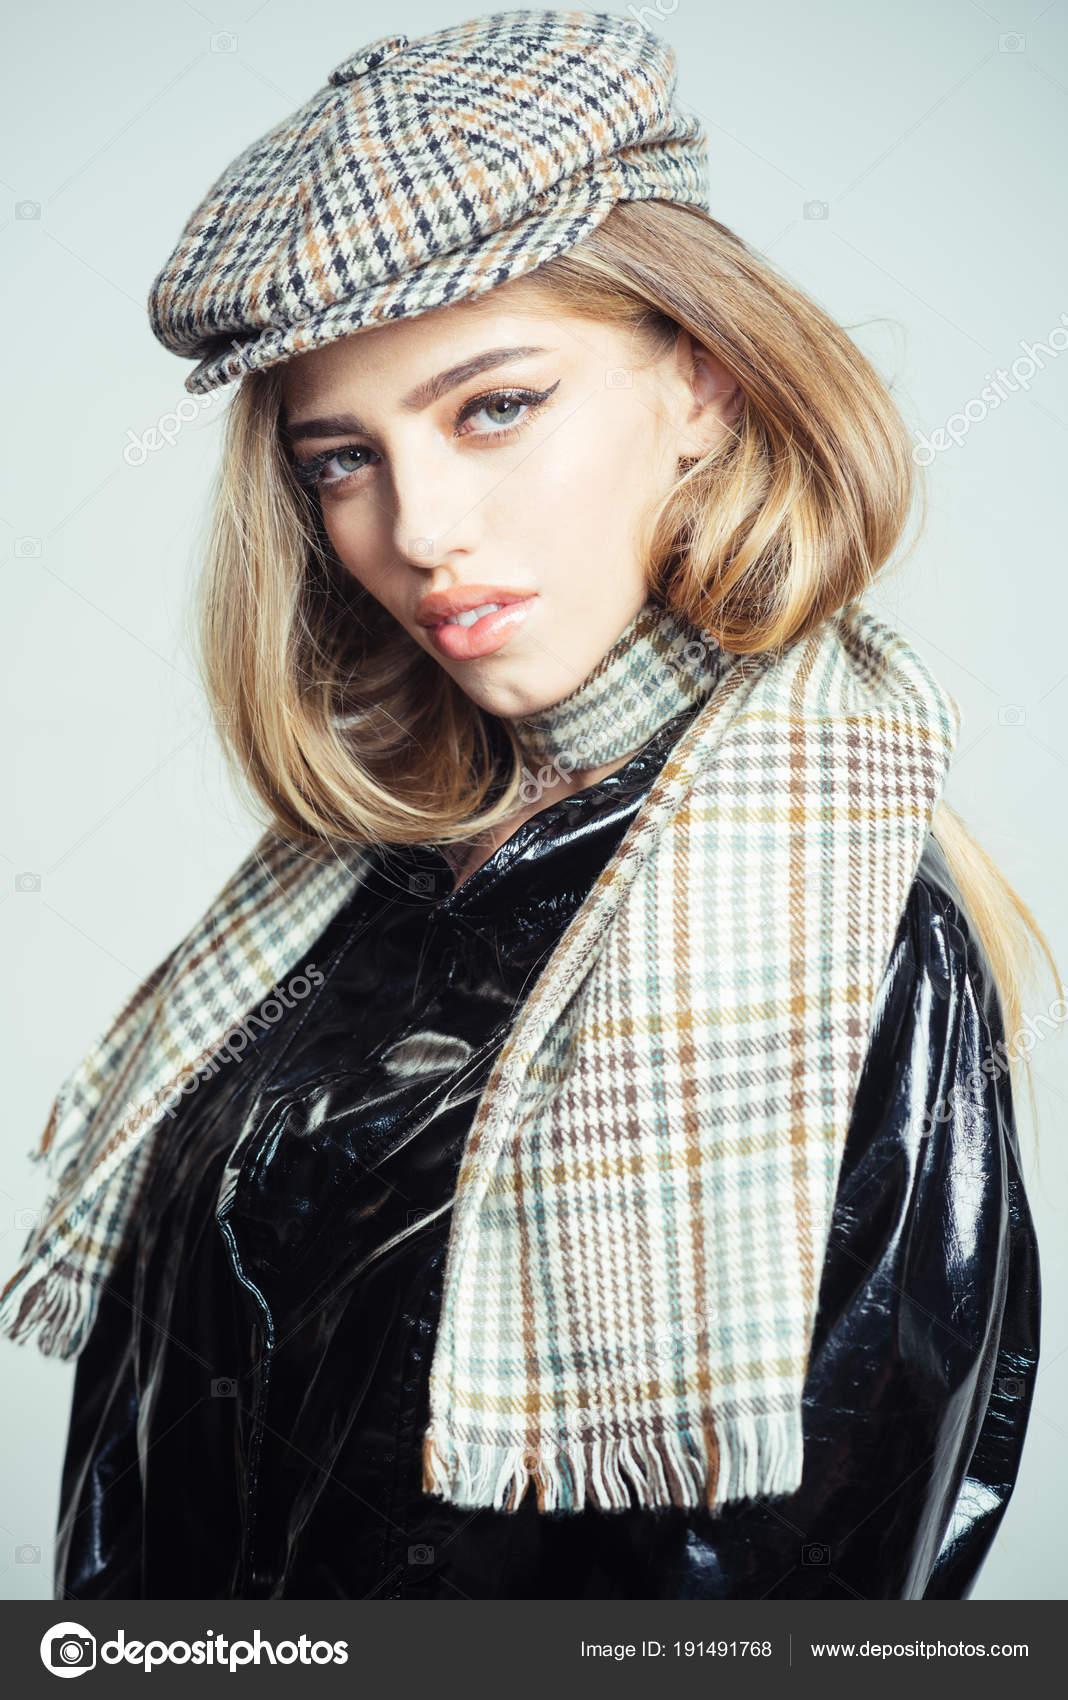 710cde6def0 Girl Long Hair Make Wears Black Cloak Plaid Kepi Scarf — Stock Photo ...